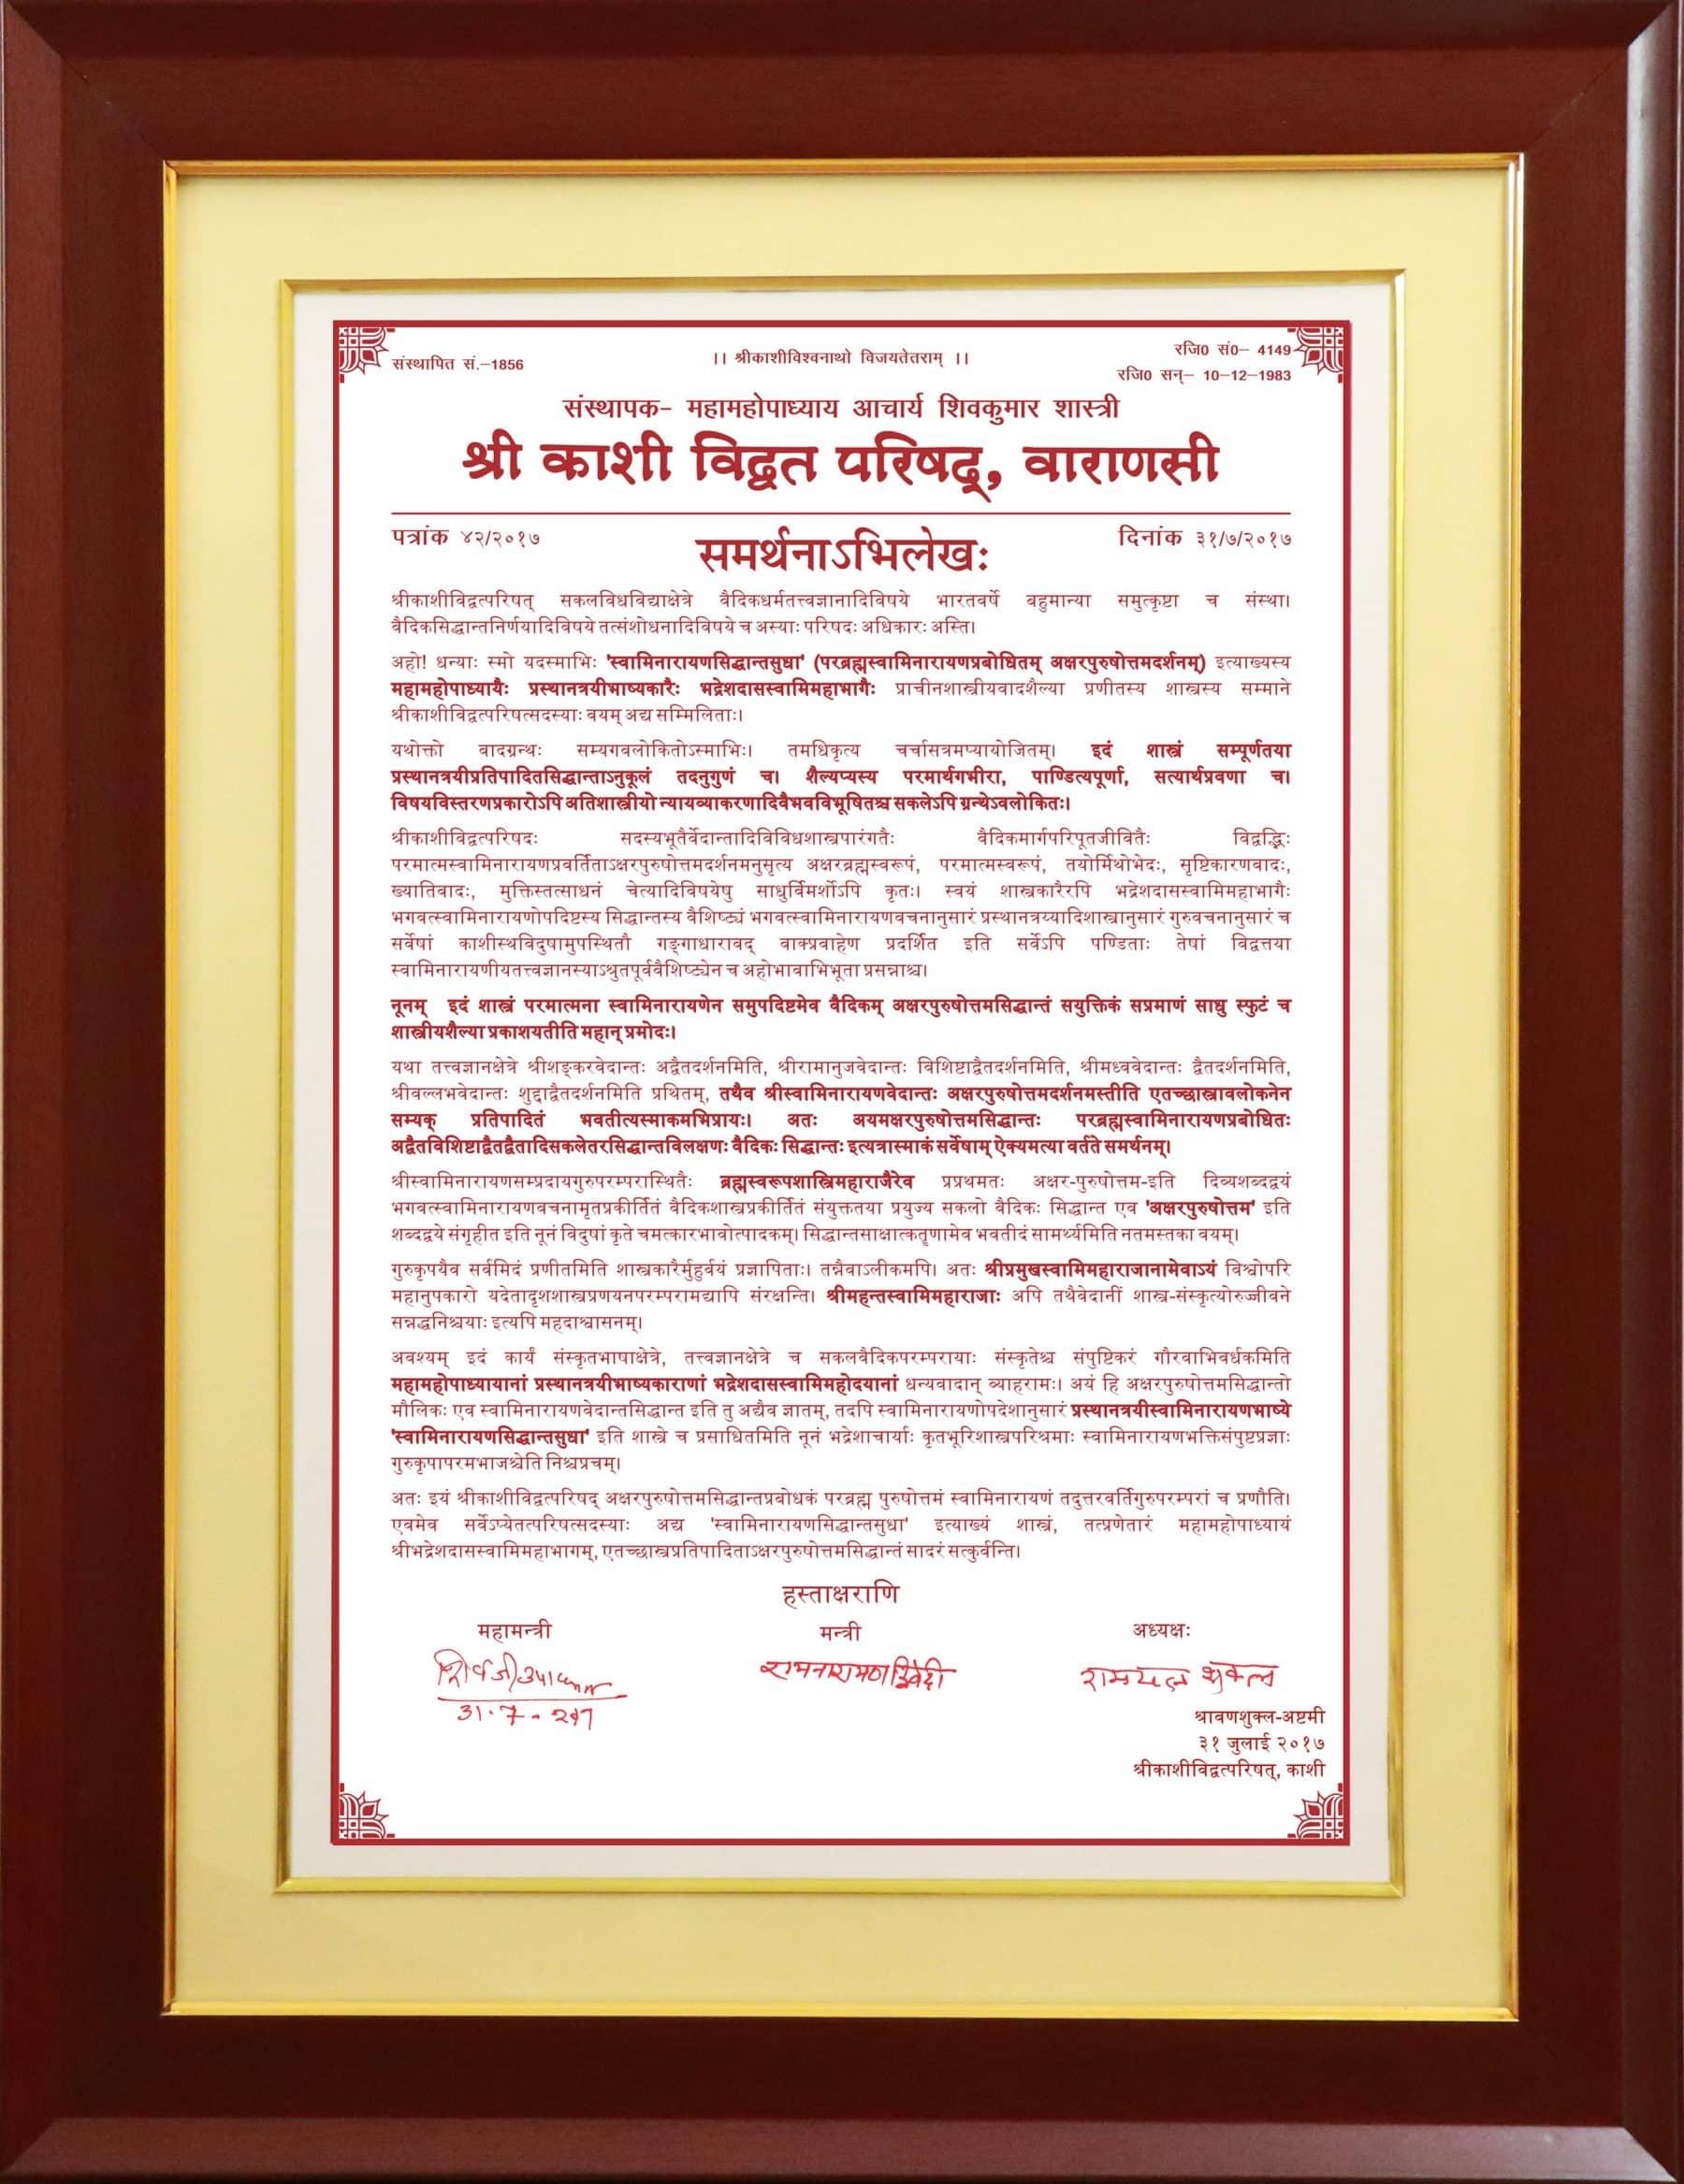 Śrī Kāśī Vidvat Pariṣad's admiration, commendation, and recognition of the Svāminārāyaṇasiddhāntasudhā by presenting the Pariṣad's letter of endorsement